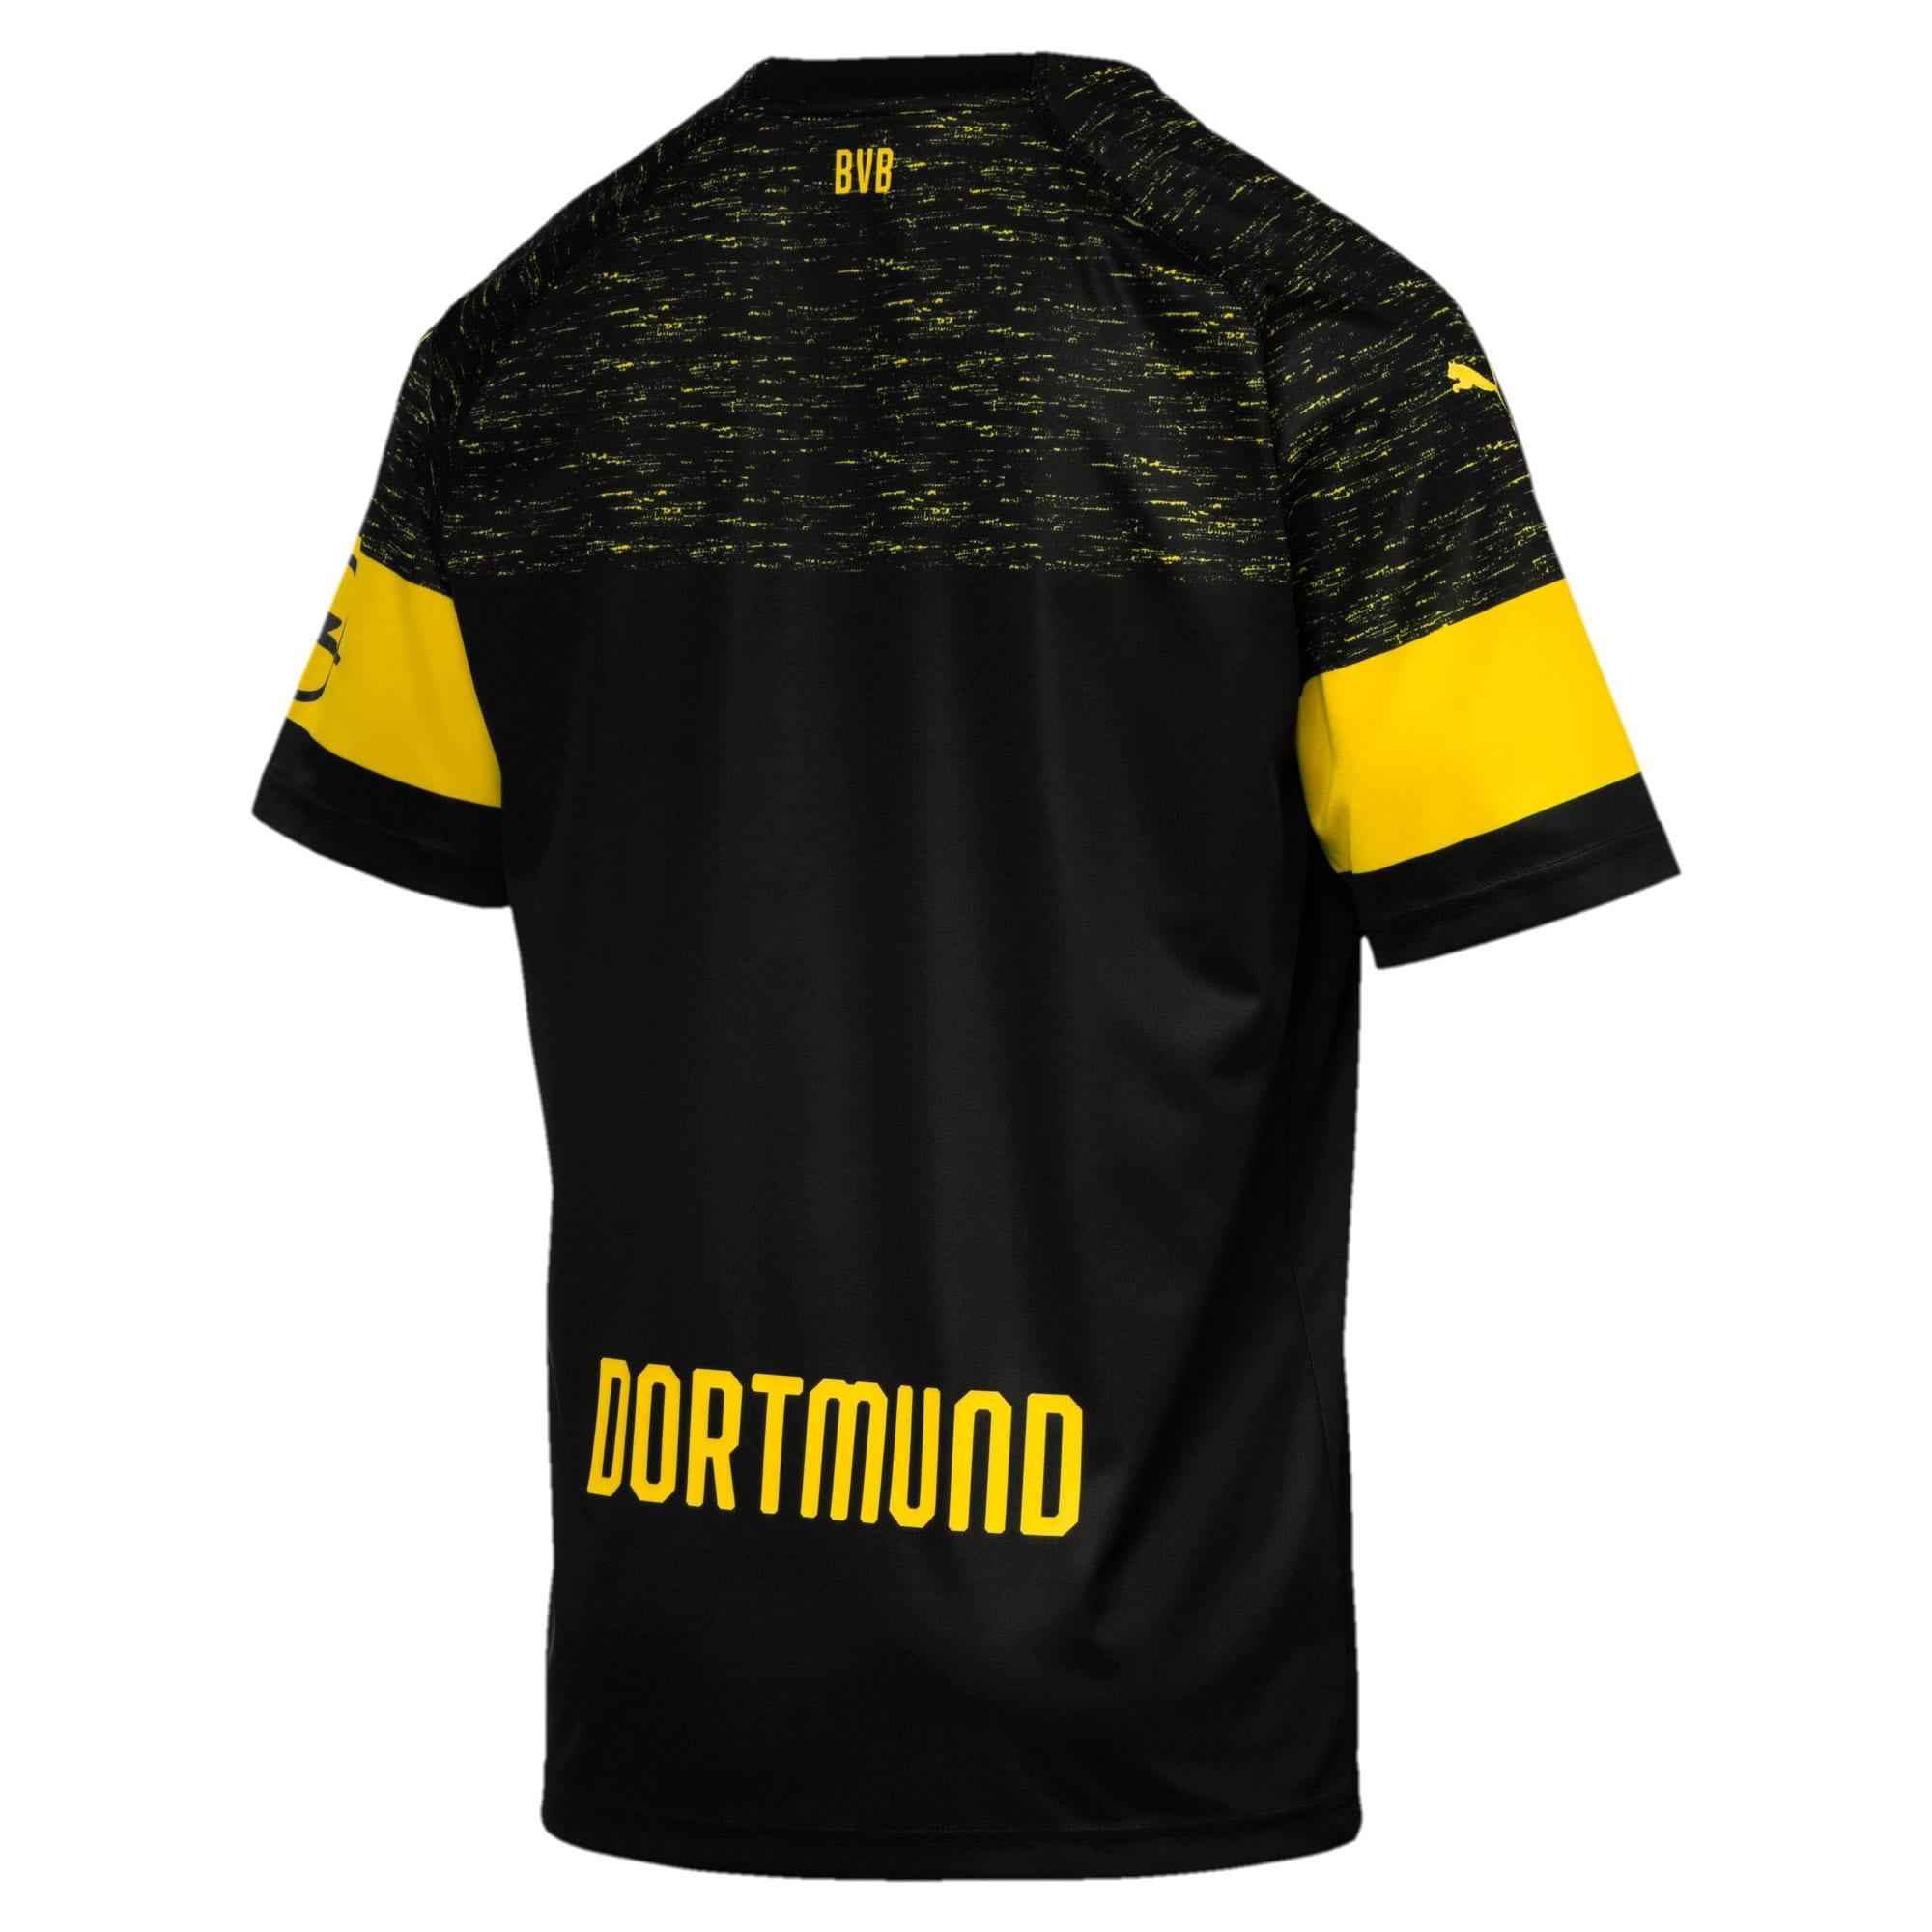 Thumbnail 3 of BVB Men's Replica Away Shirt, Puma Black, medium